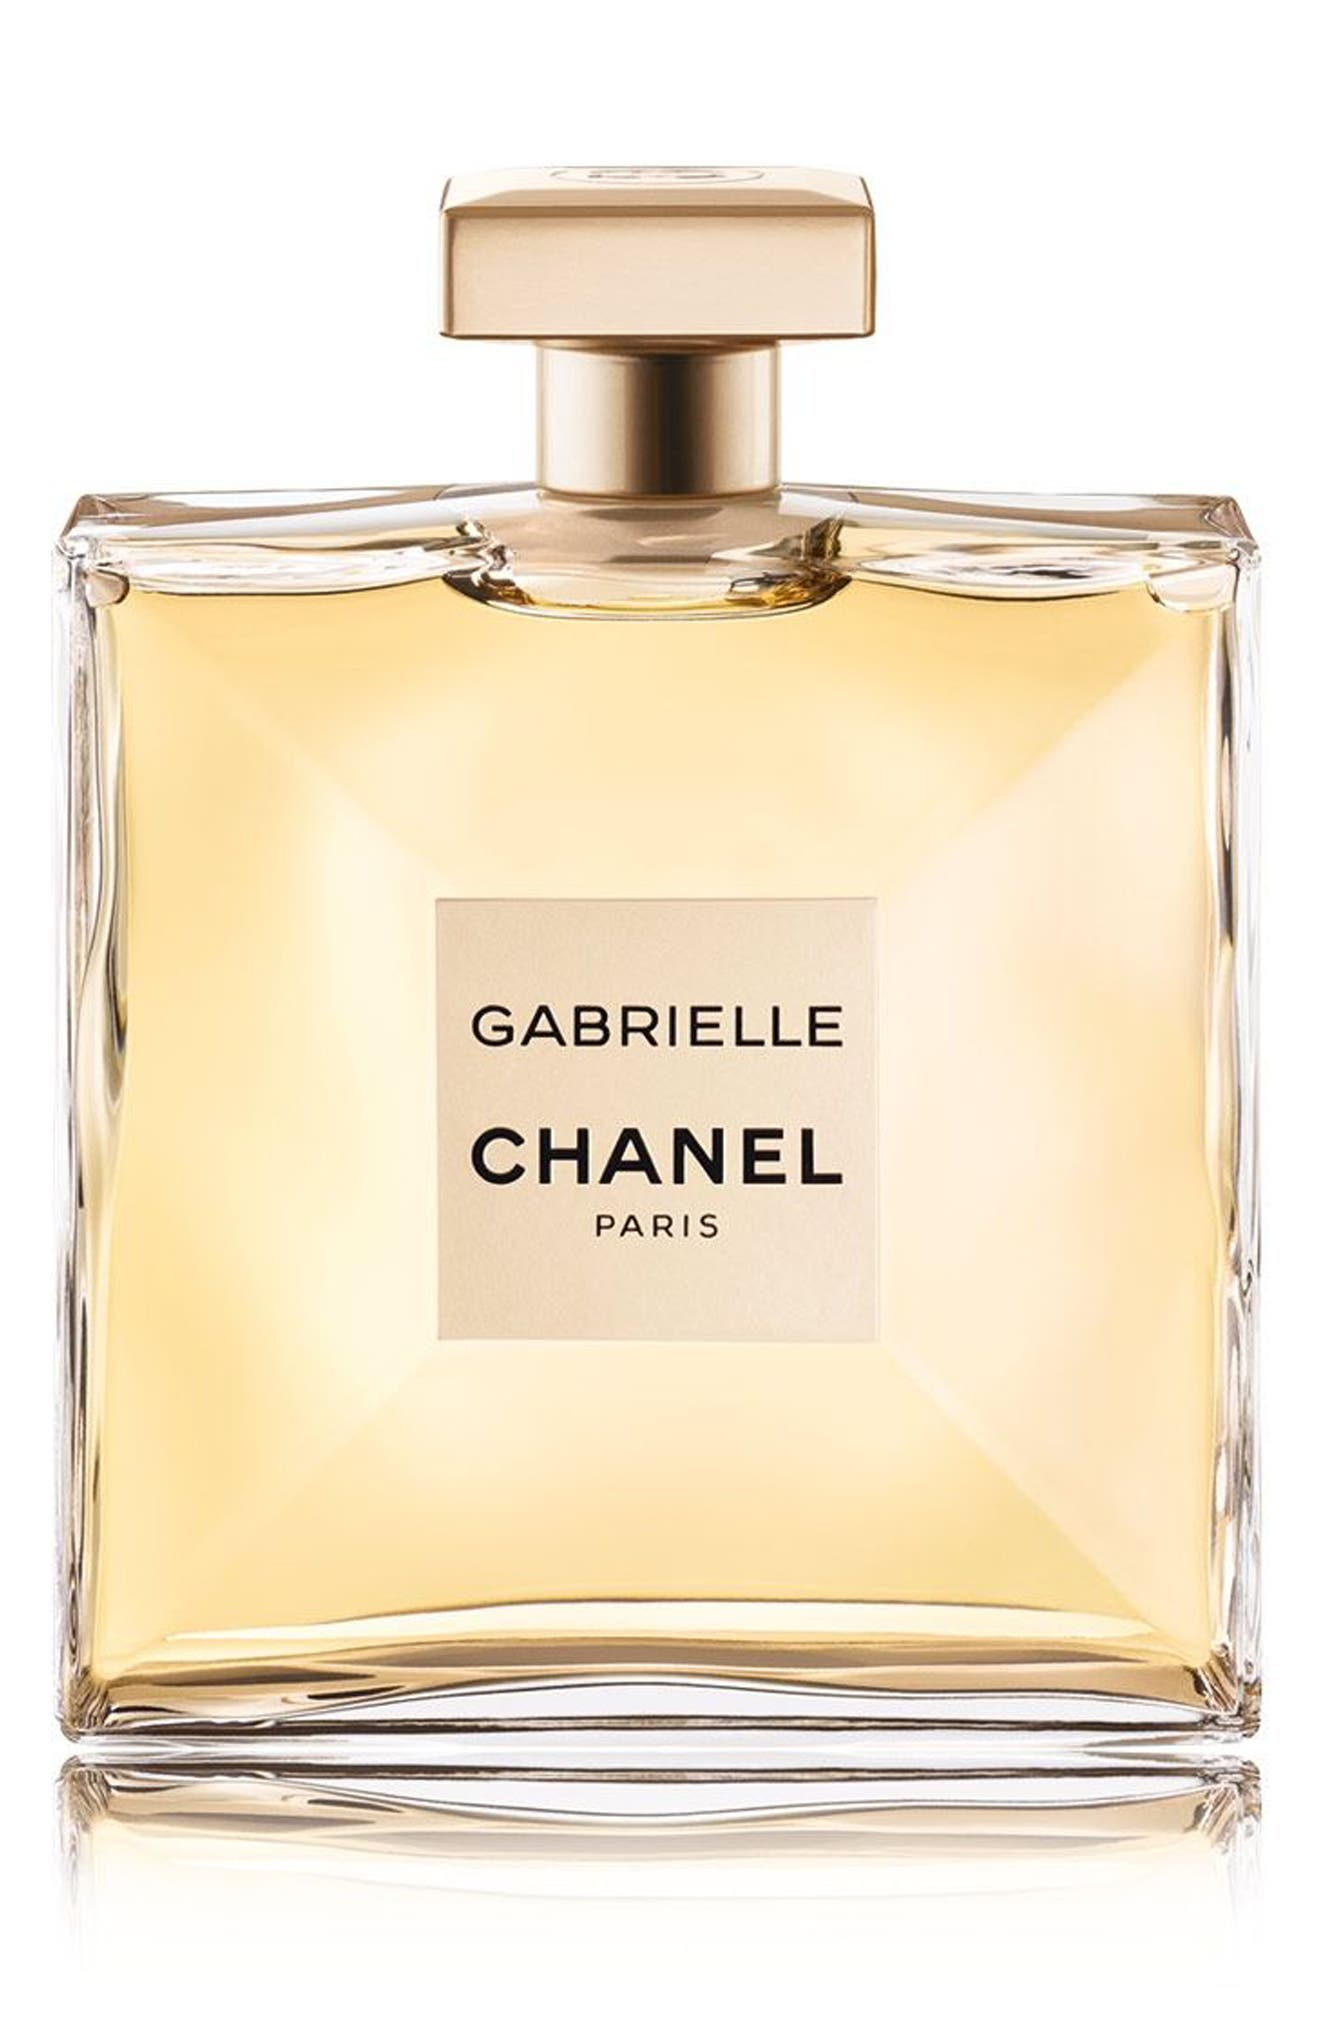 Main Image - CHANEL GABRIELLE CHANEL  Eau de Parfum Spray